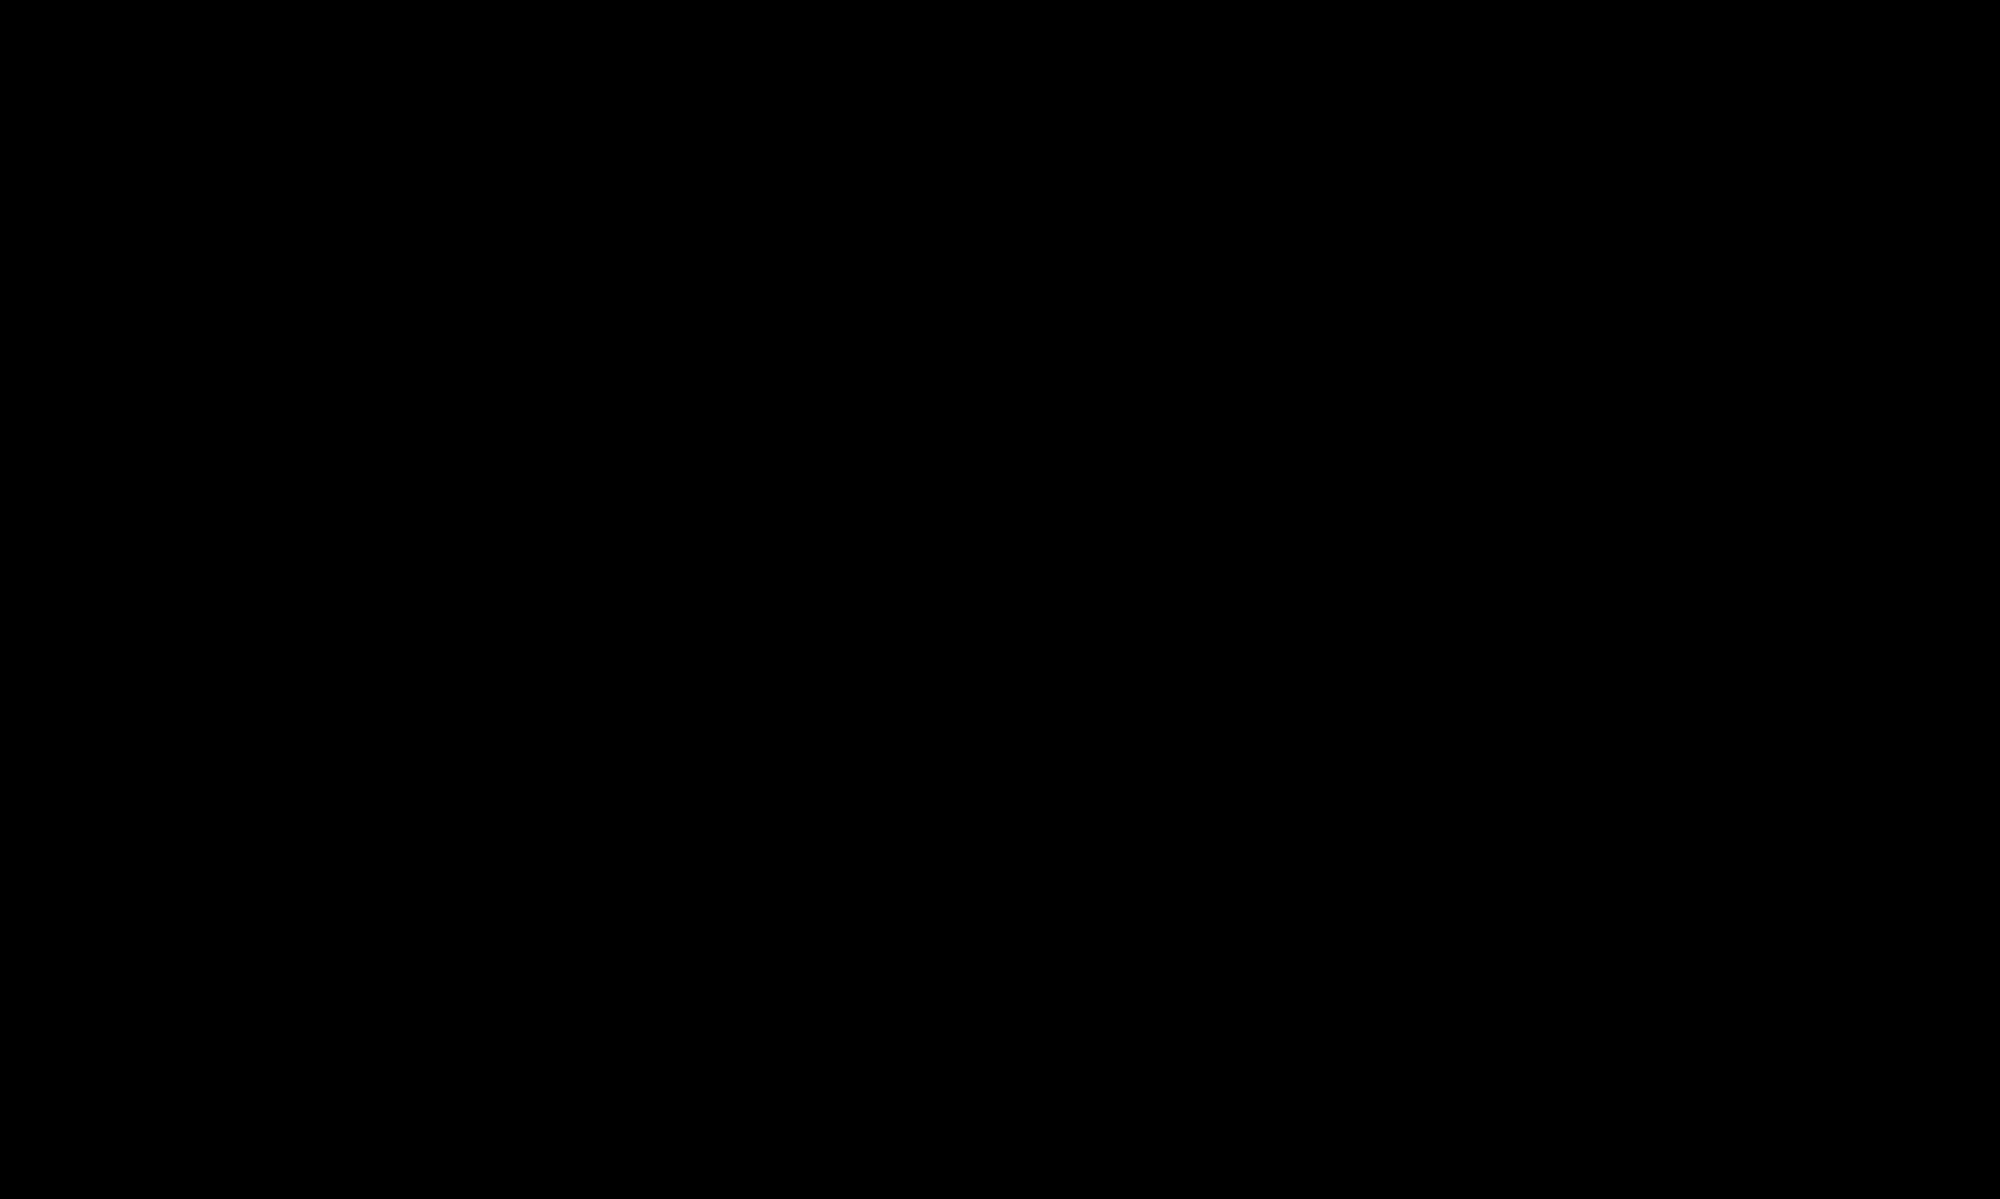 BUSHIDO STYLE